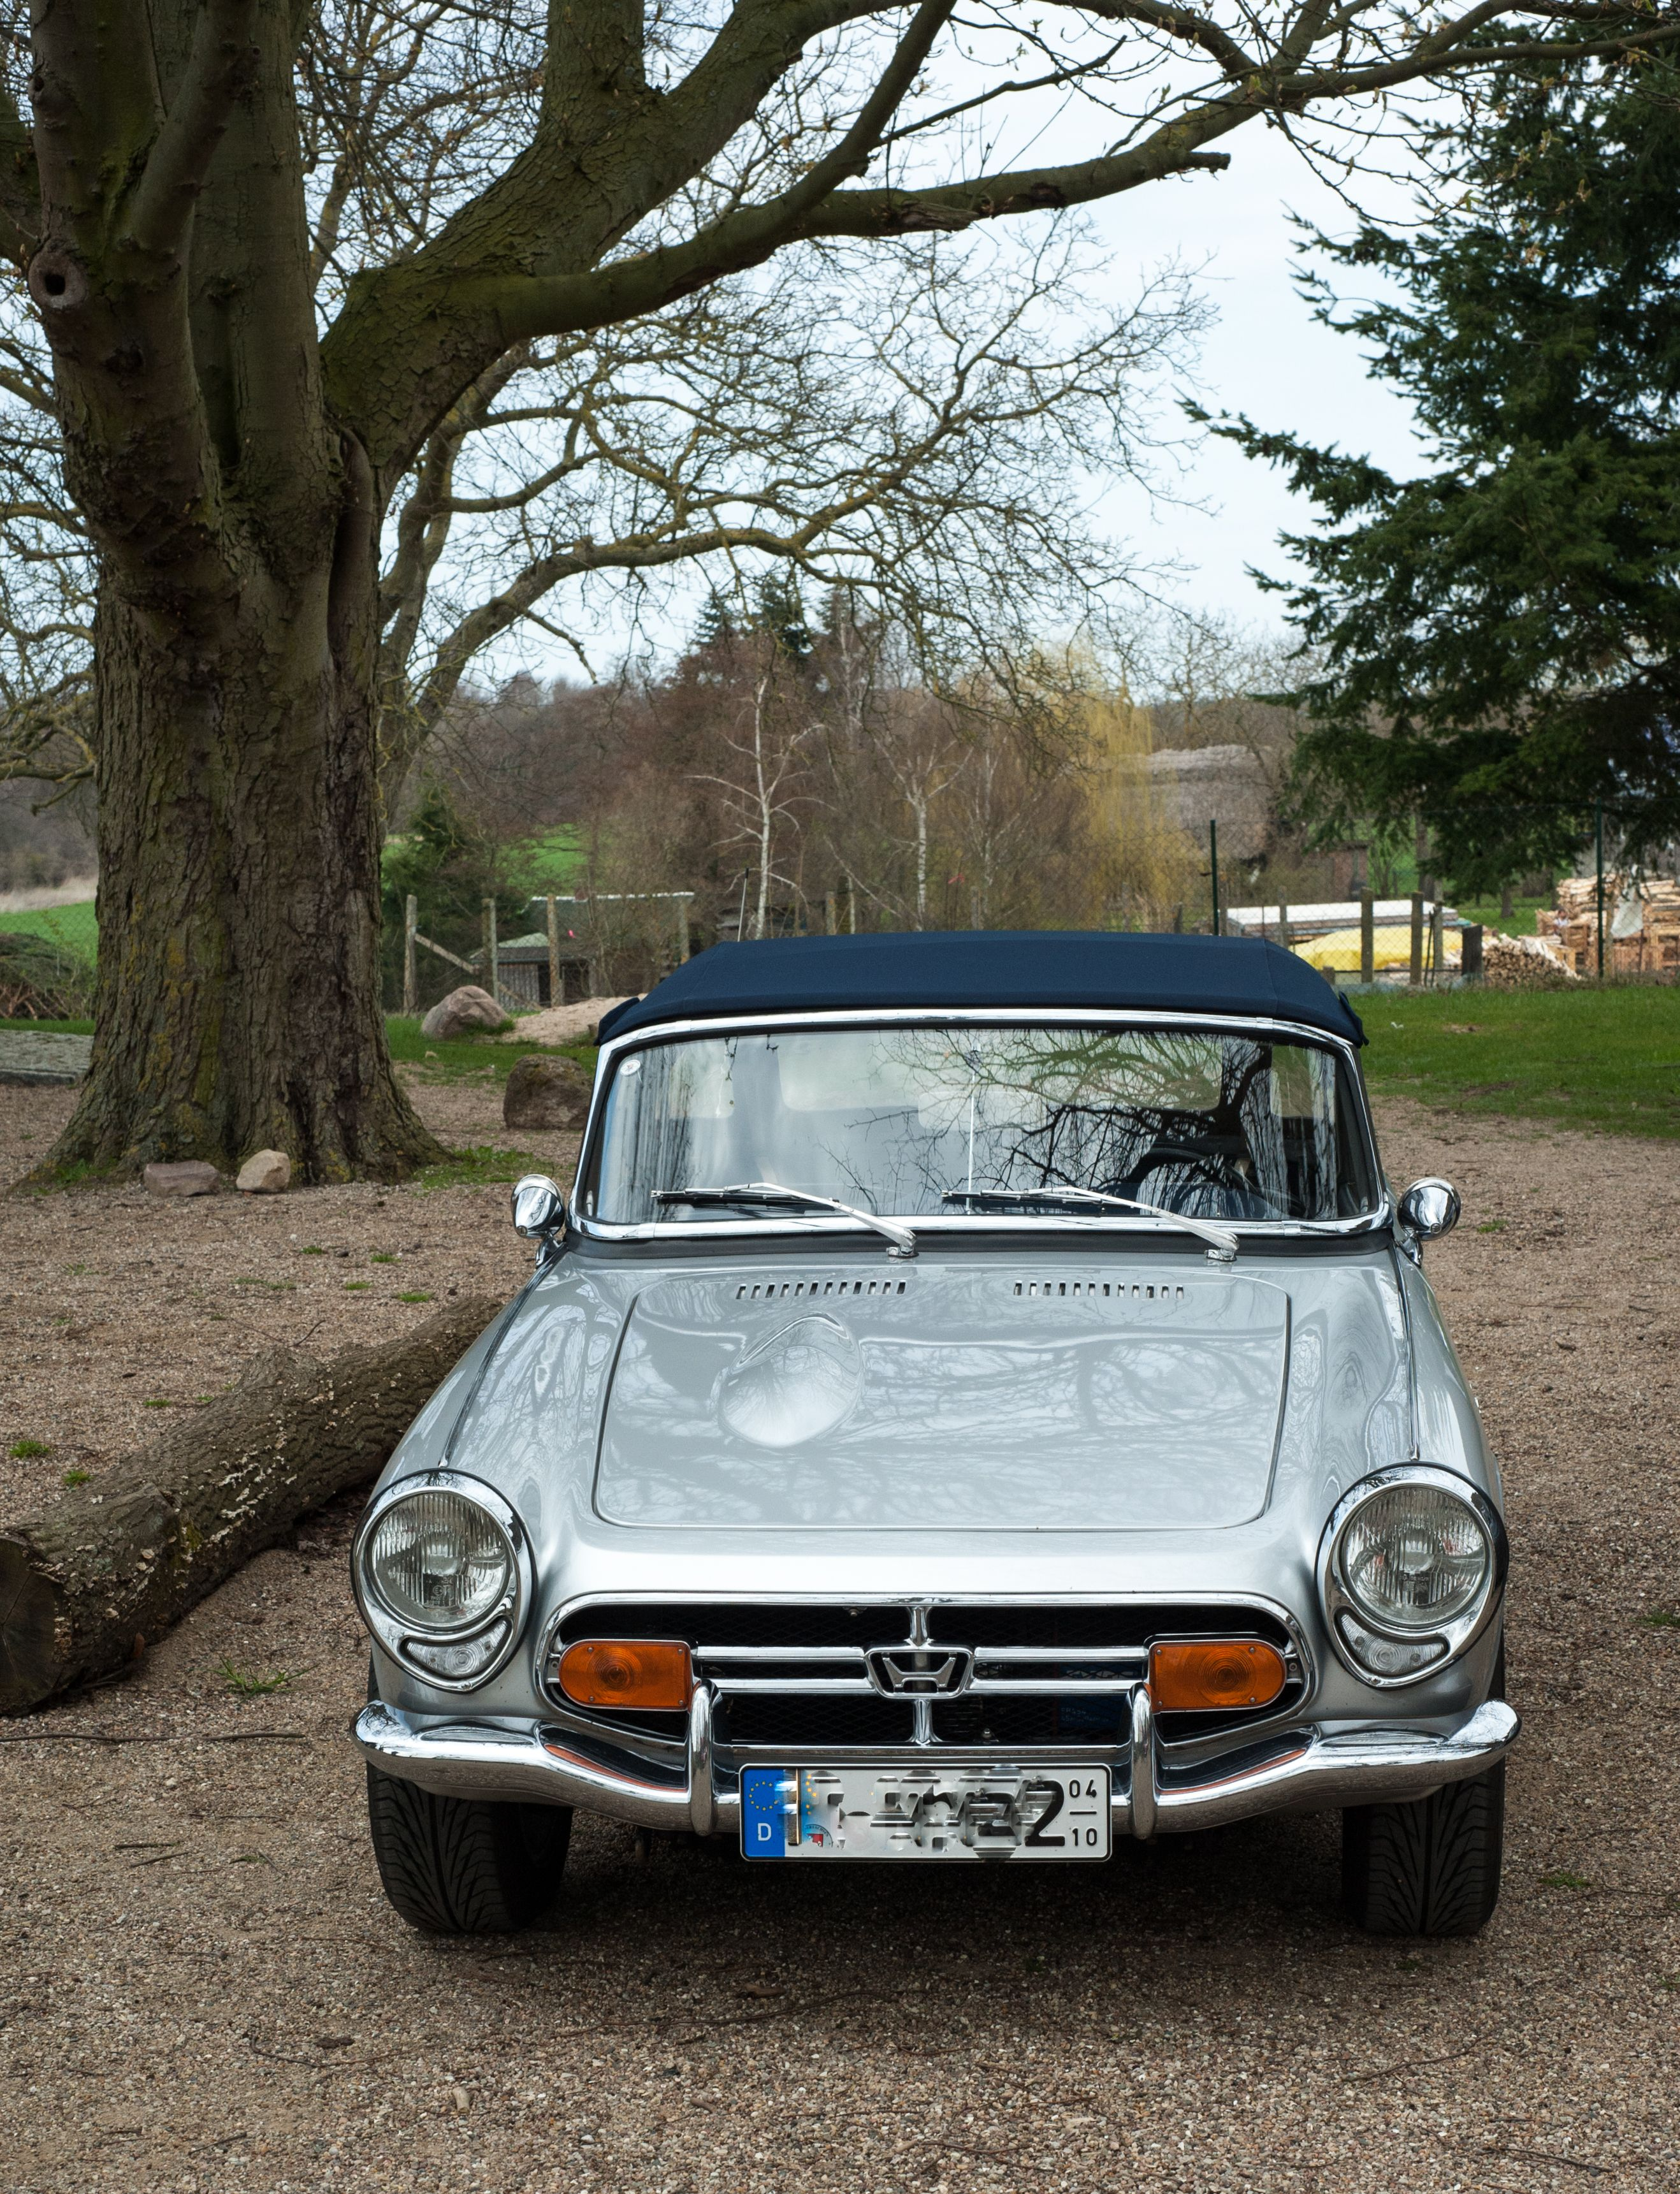 Honda S800 1966  |  ☛⊼² 1,5´   https://de.pinterest.com/chikanozawa/%E5%A5%BD%E3%81%8D%E3%81%AA%E8%87%AA%E5%8B%95%E8%BB%8A/